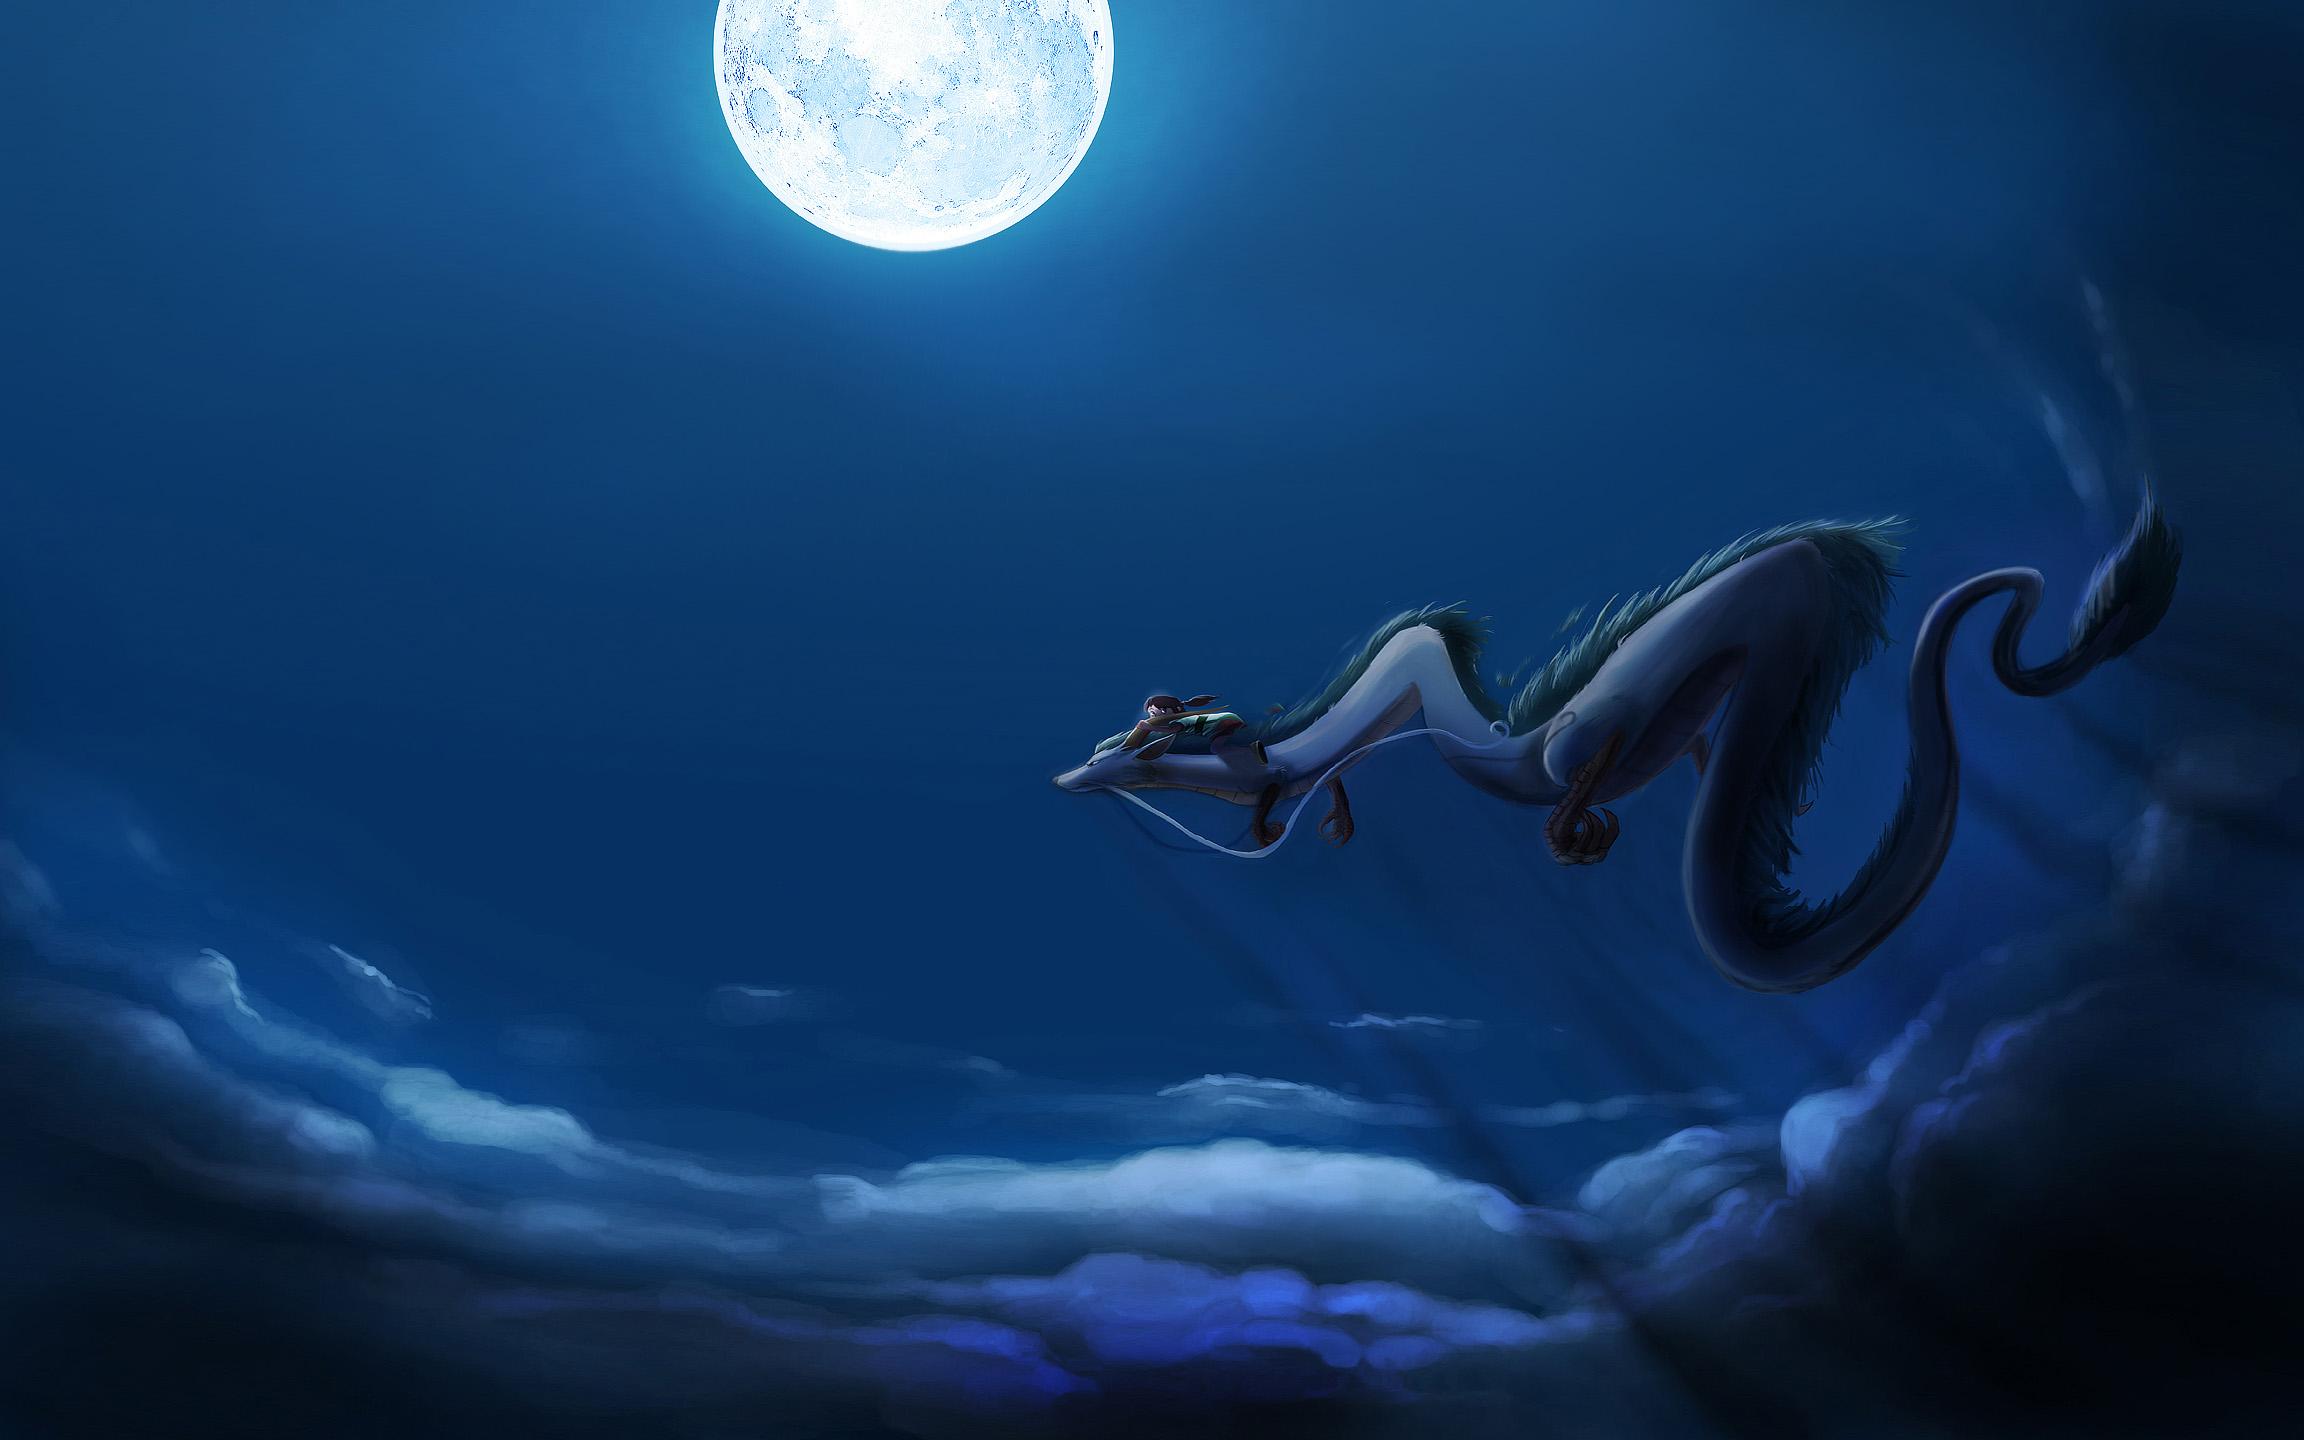 Great Wallpaper Night Dragon - Sen  Image.jpg